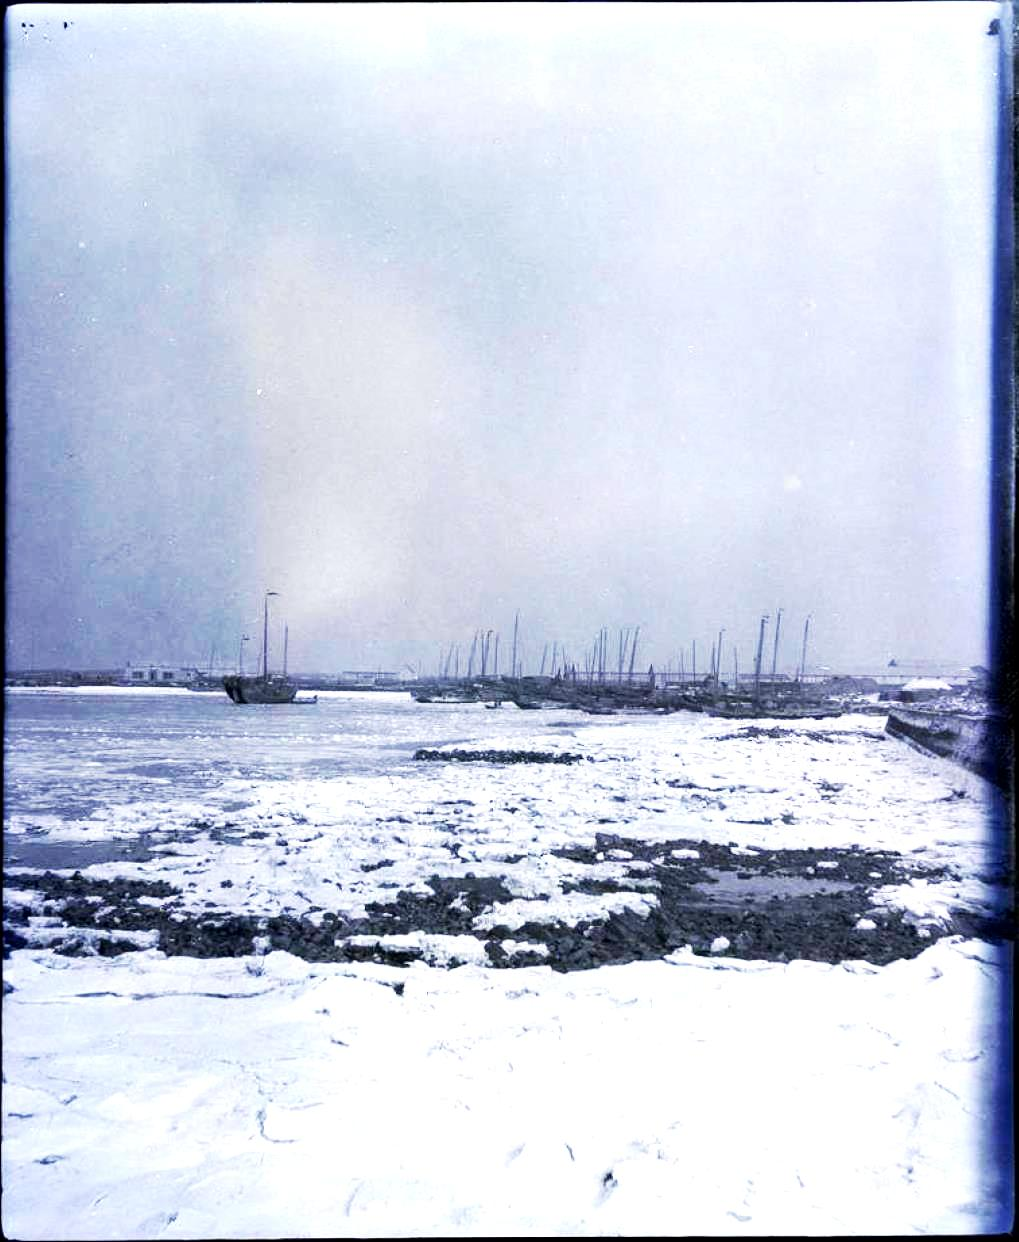 09. Дальний. Замерзшая бухта и лодки